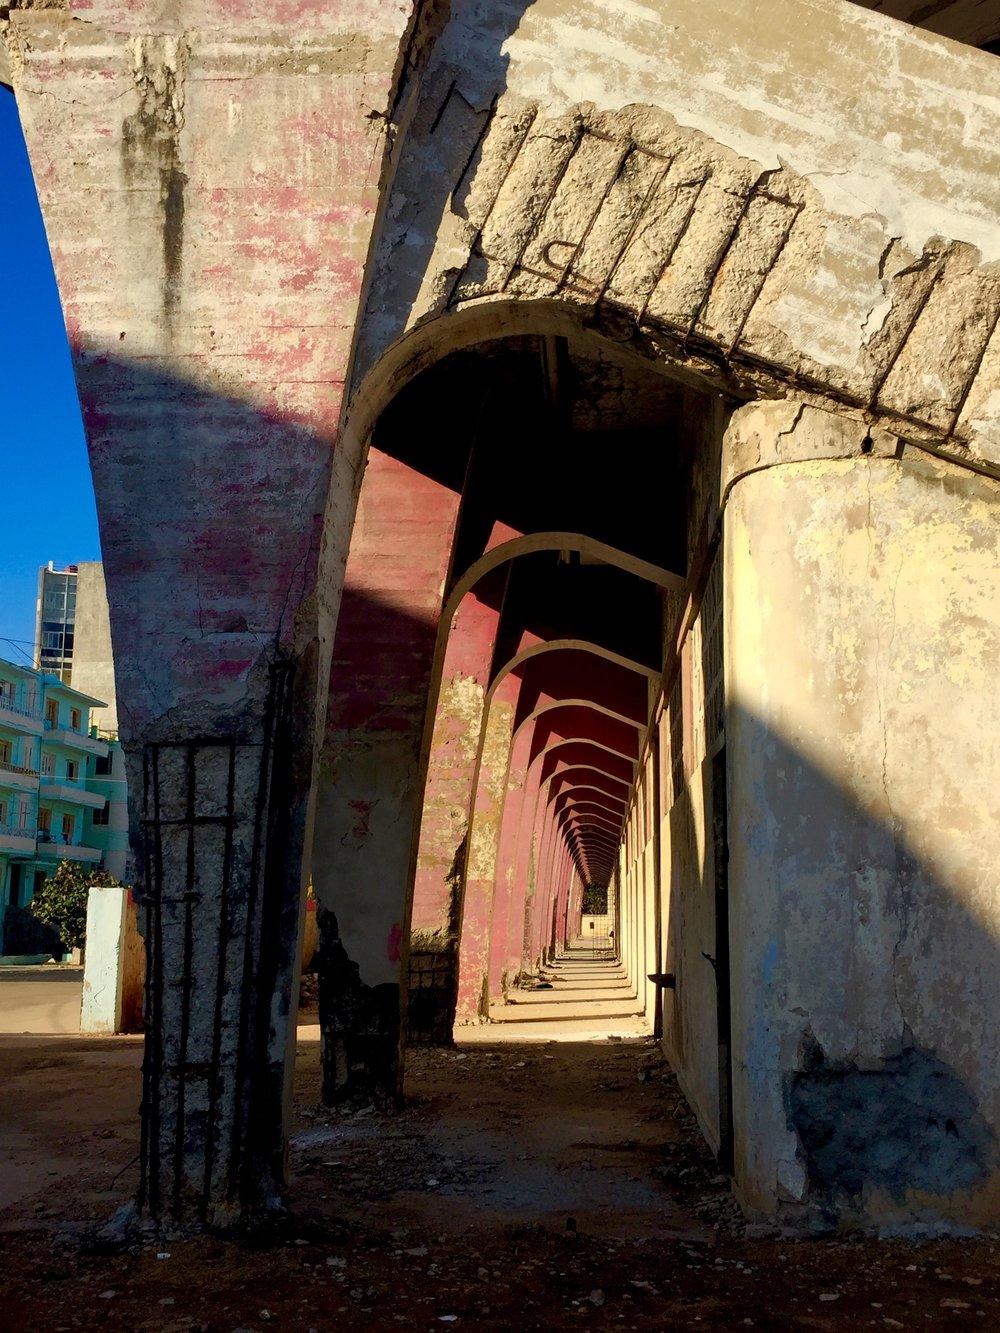 OLYMPIC STADIUM - HABANA, CUBA